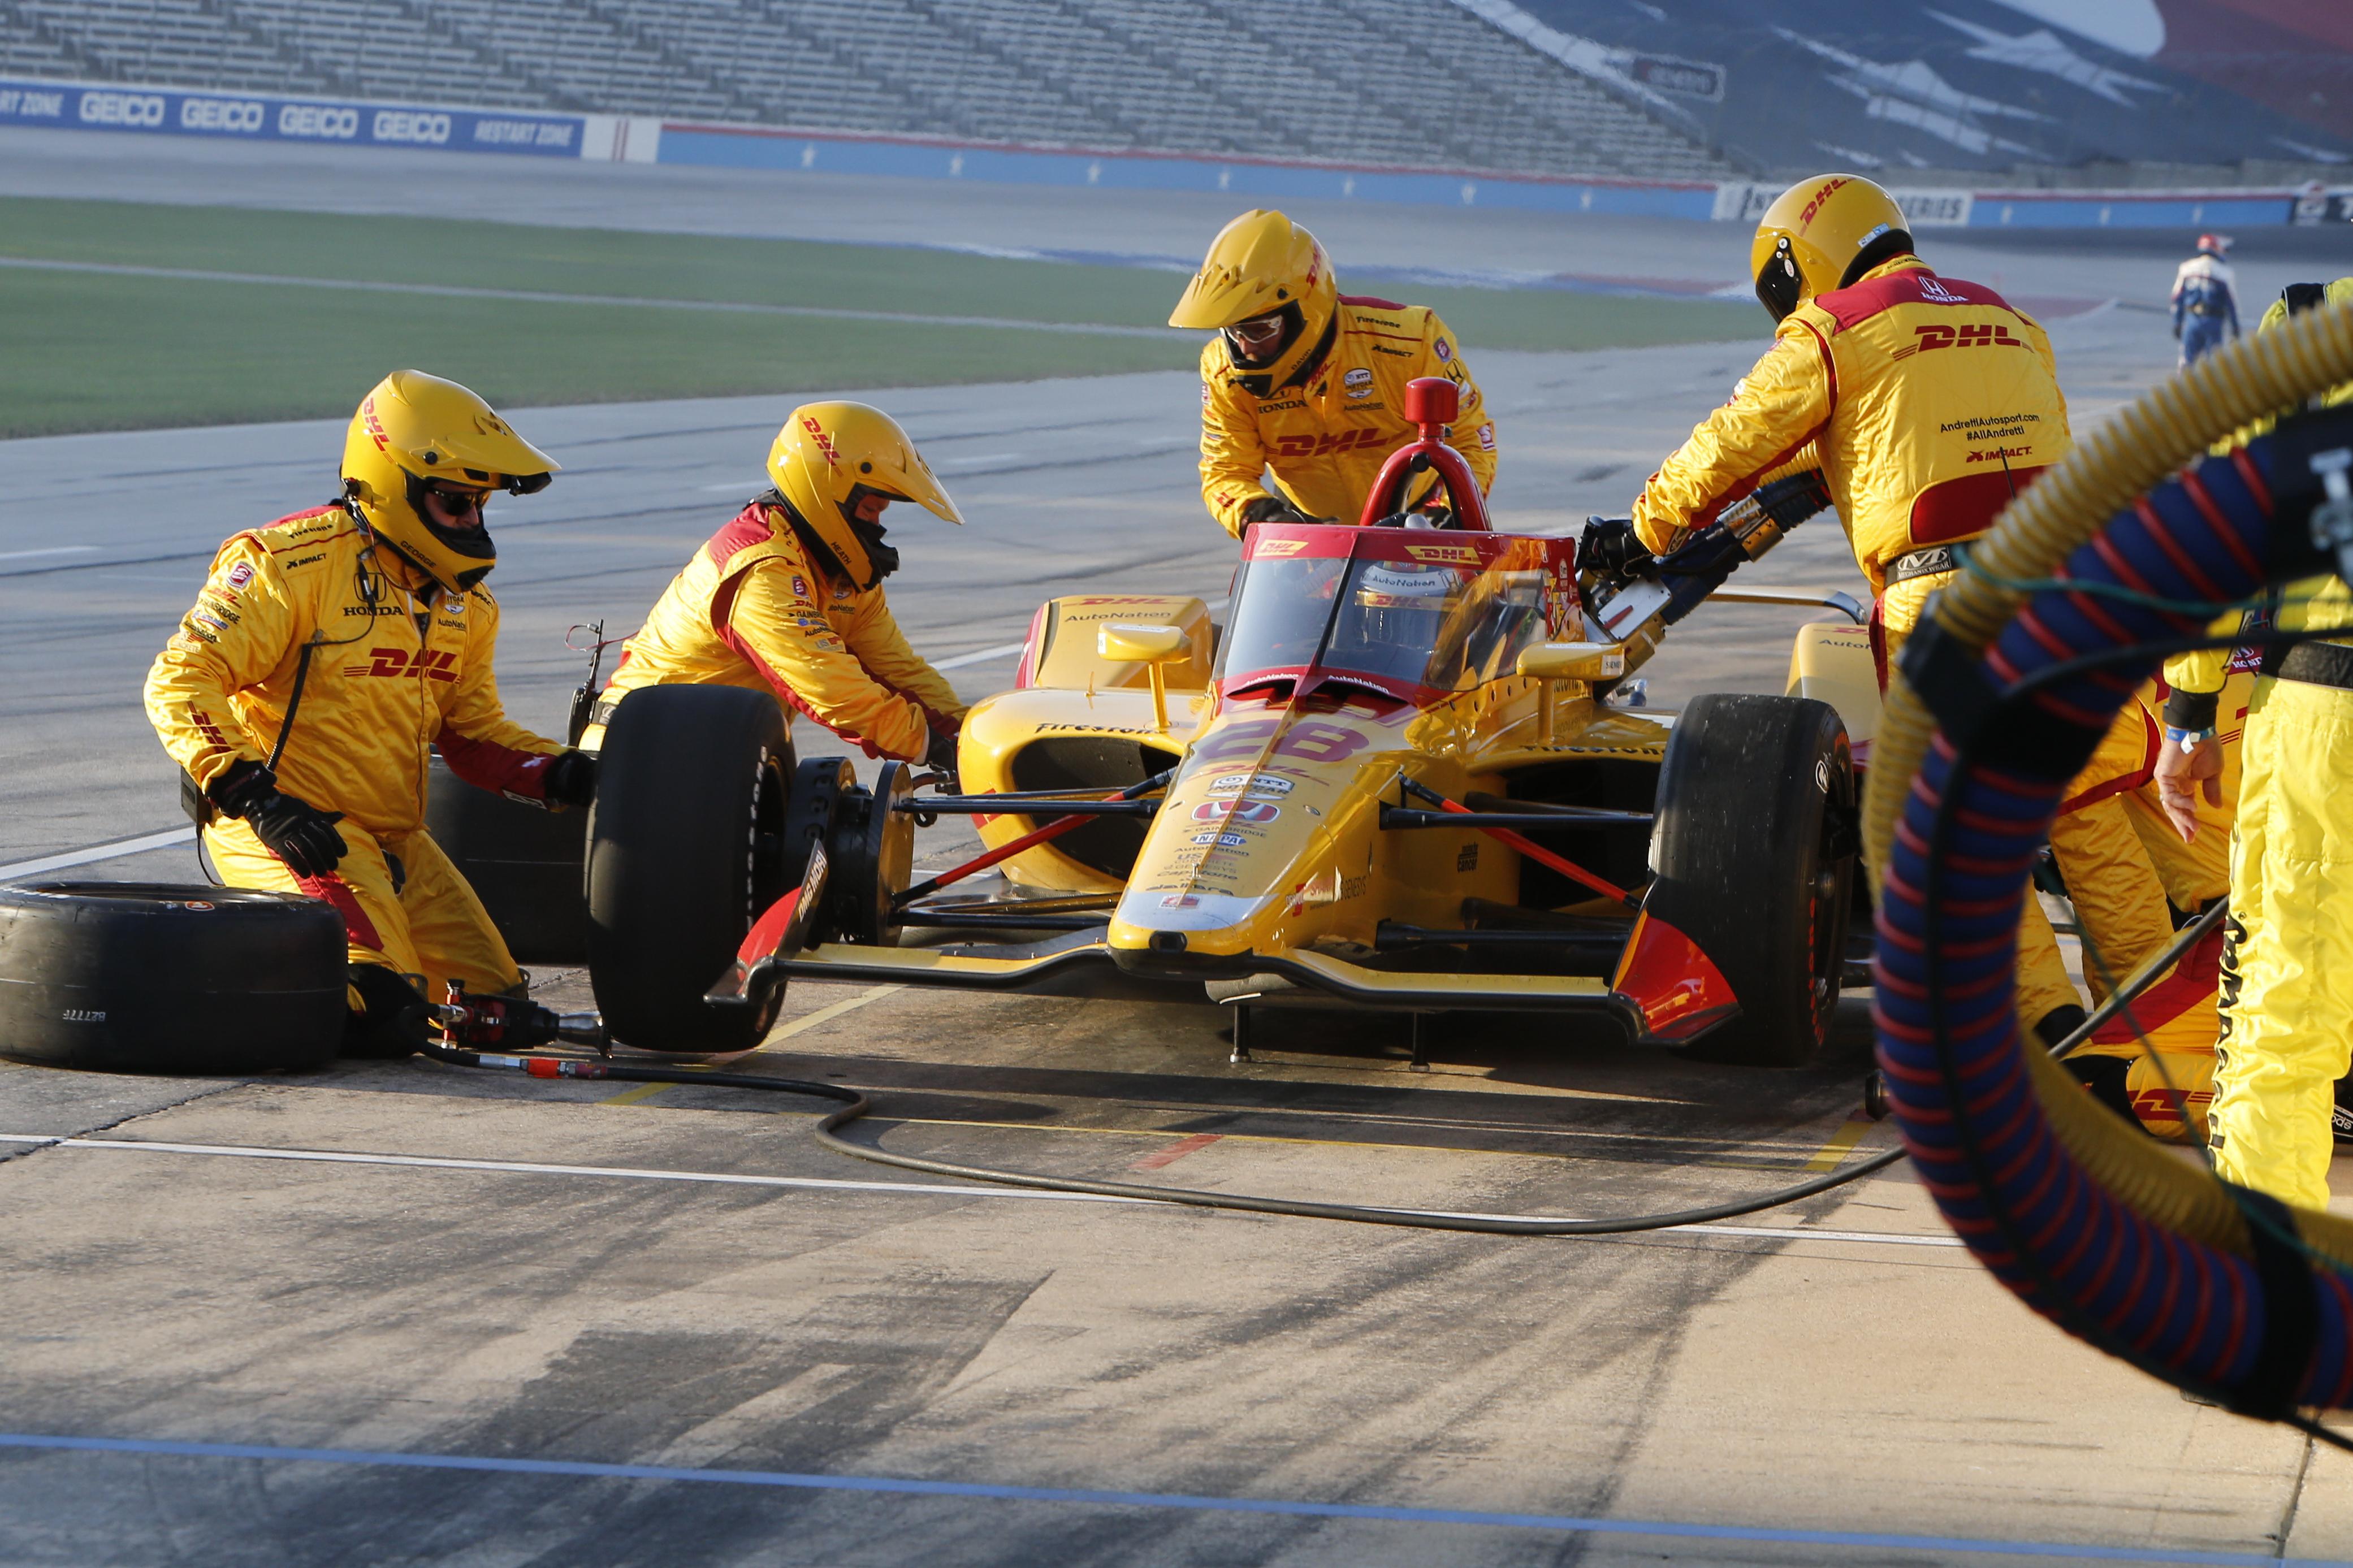 Ryan Hunter-Reay Andretti Texas IndyCar 2020